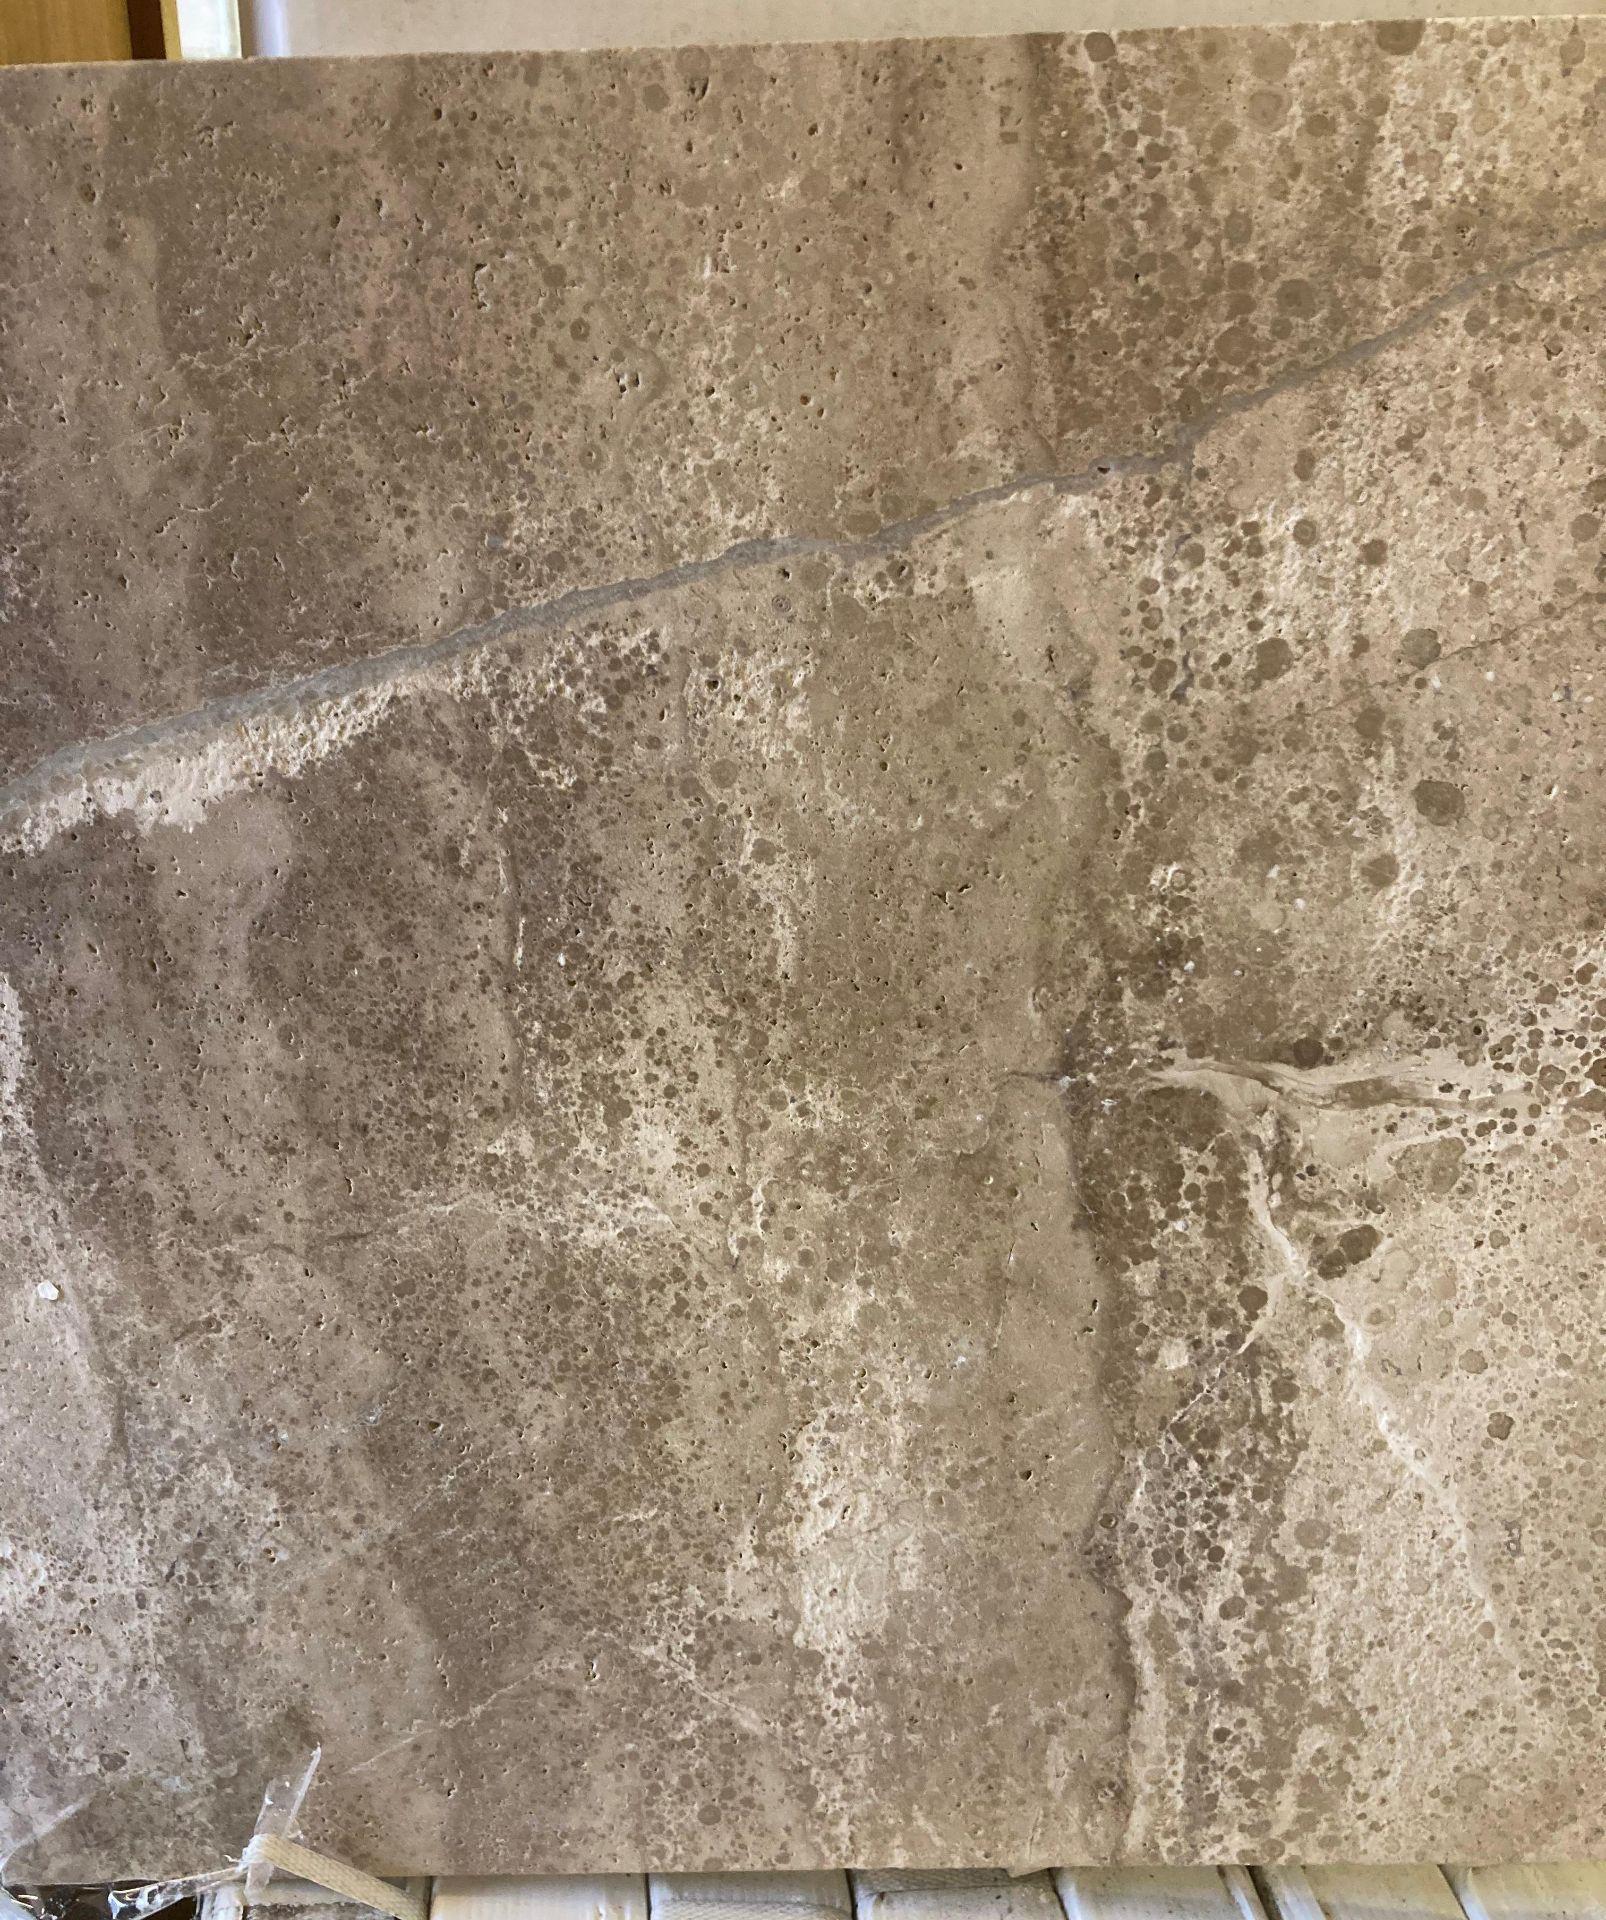 22 x packs of 4 marble tiramisu vein cut brushed tiles - 40 x 40 x 1.